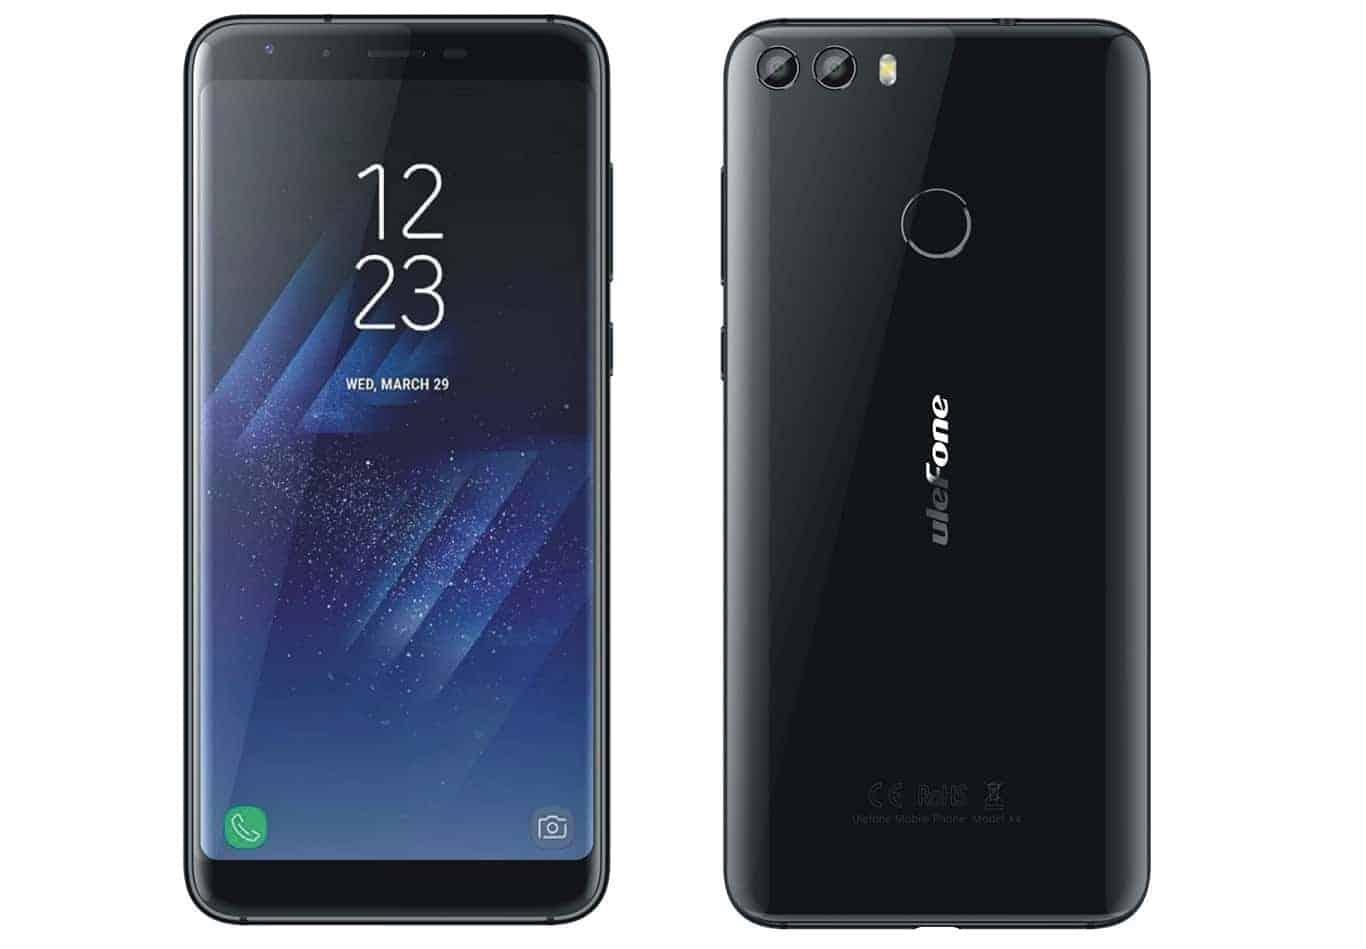 Ulefone F2 First Phone To Sport An 'Infinity Display' & 8GB RAM